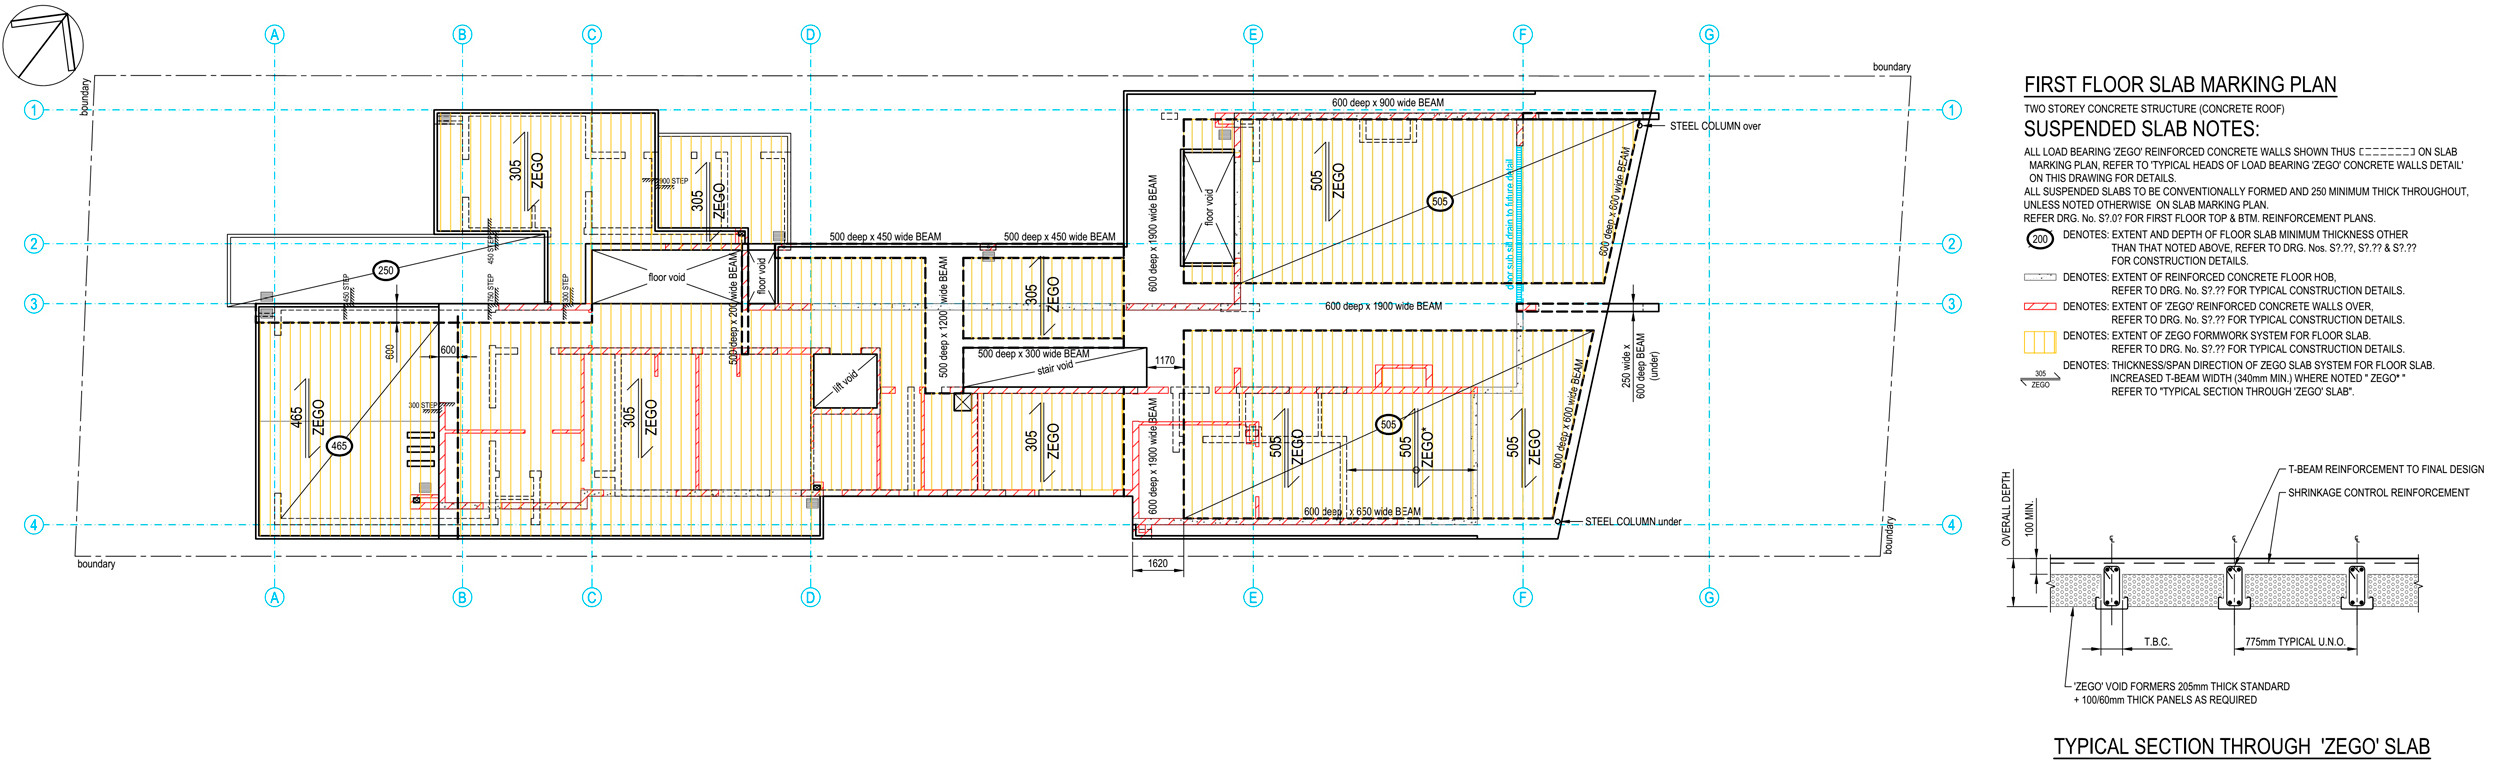 AUS02-17097-FF-slab-plan-2500px.jpg